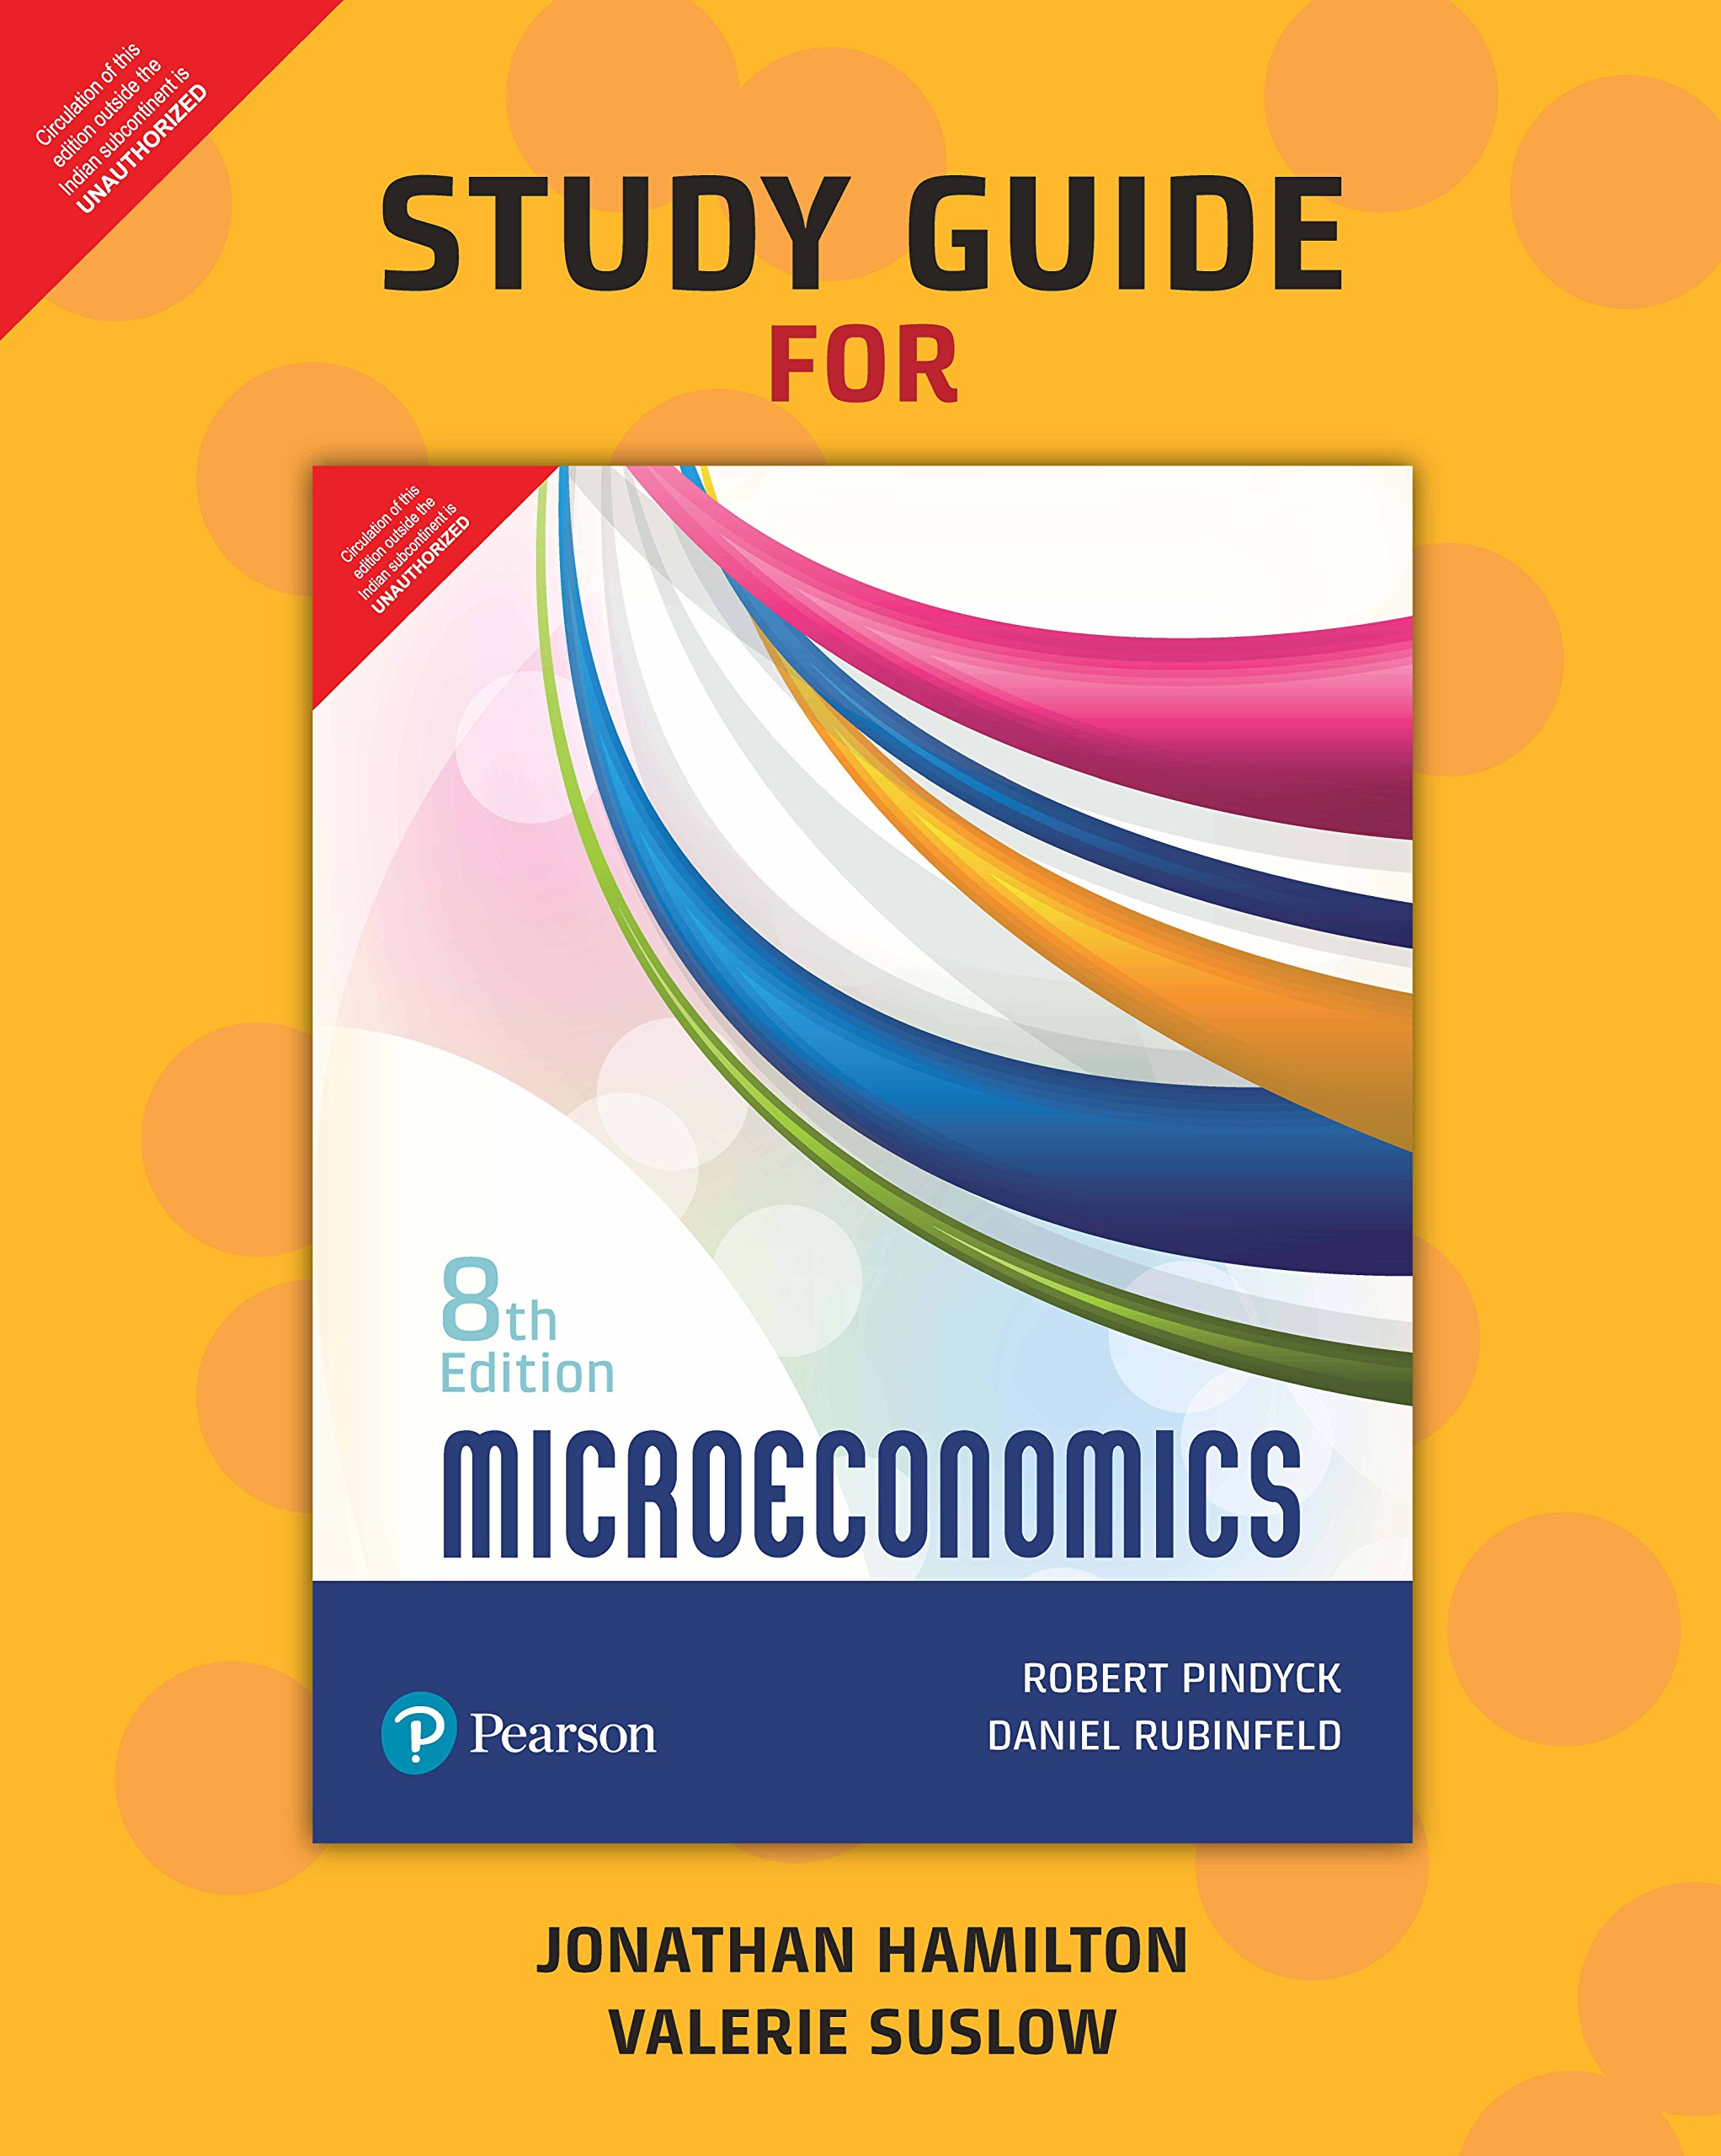 Study Guide For Microeconomics, 8Th Edition: Pindyck Robert And Rubinfeld  Daniel: 9789352862702: Amazon.com: Books